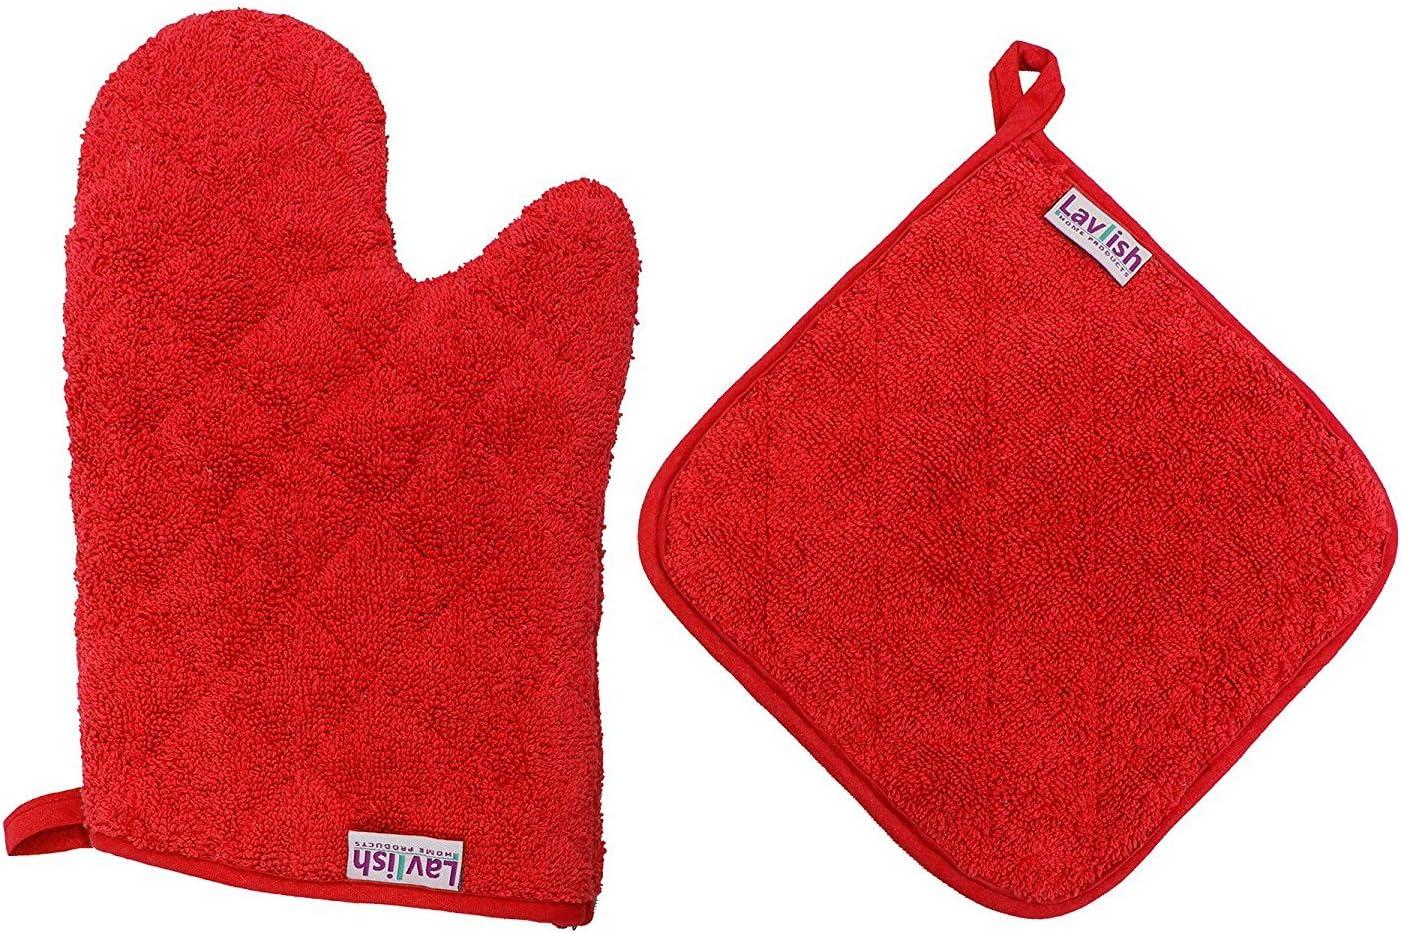 Lavlish Oven Mitt & Pot Holder Set 100% Cotton, Red